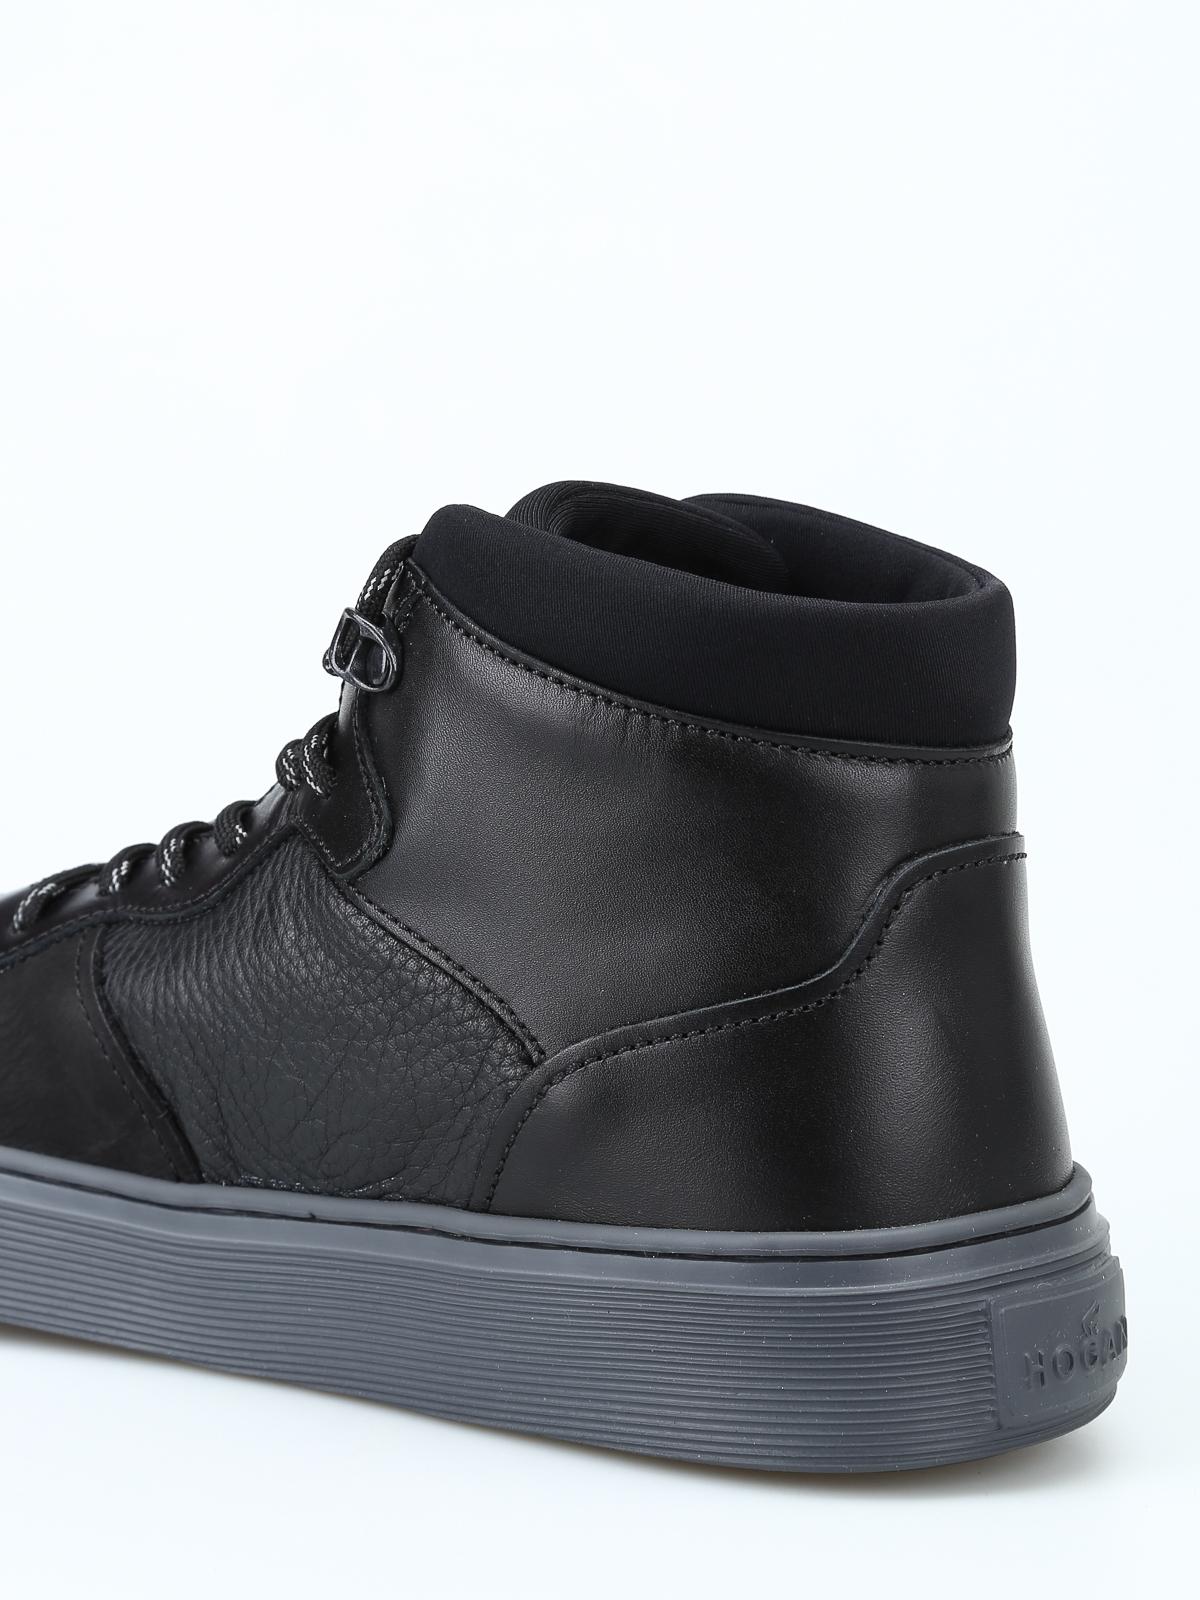 c597748dce Hogan - Sneaker alte H365 nere modello basket - sneakers ...